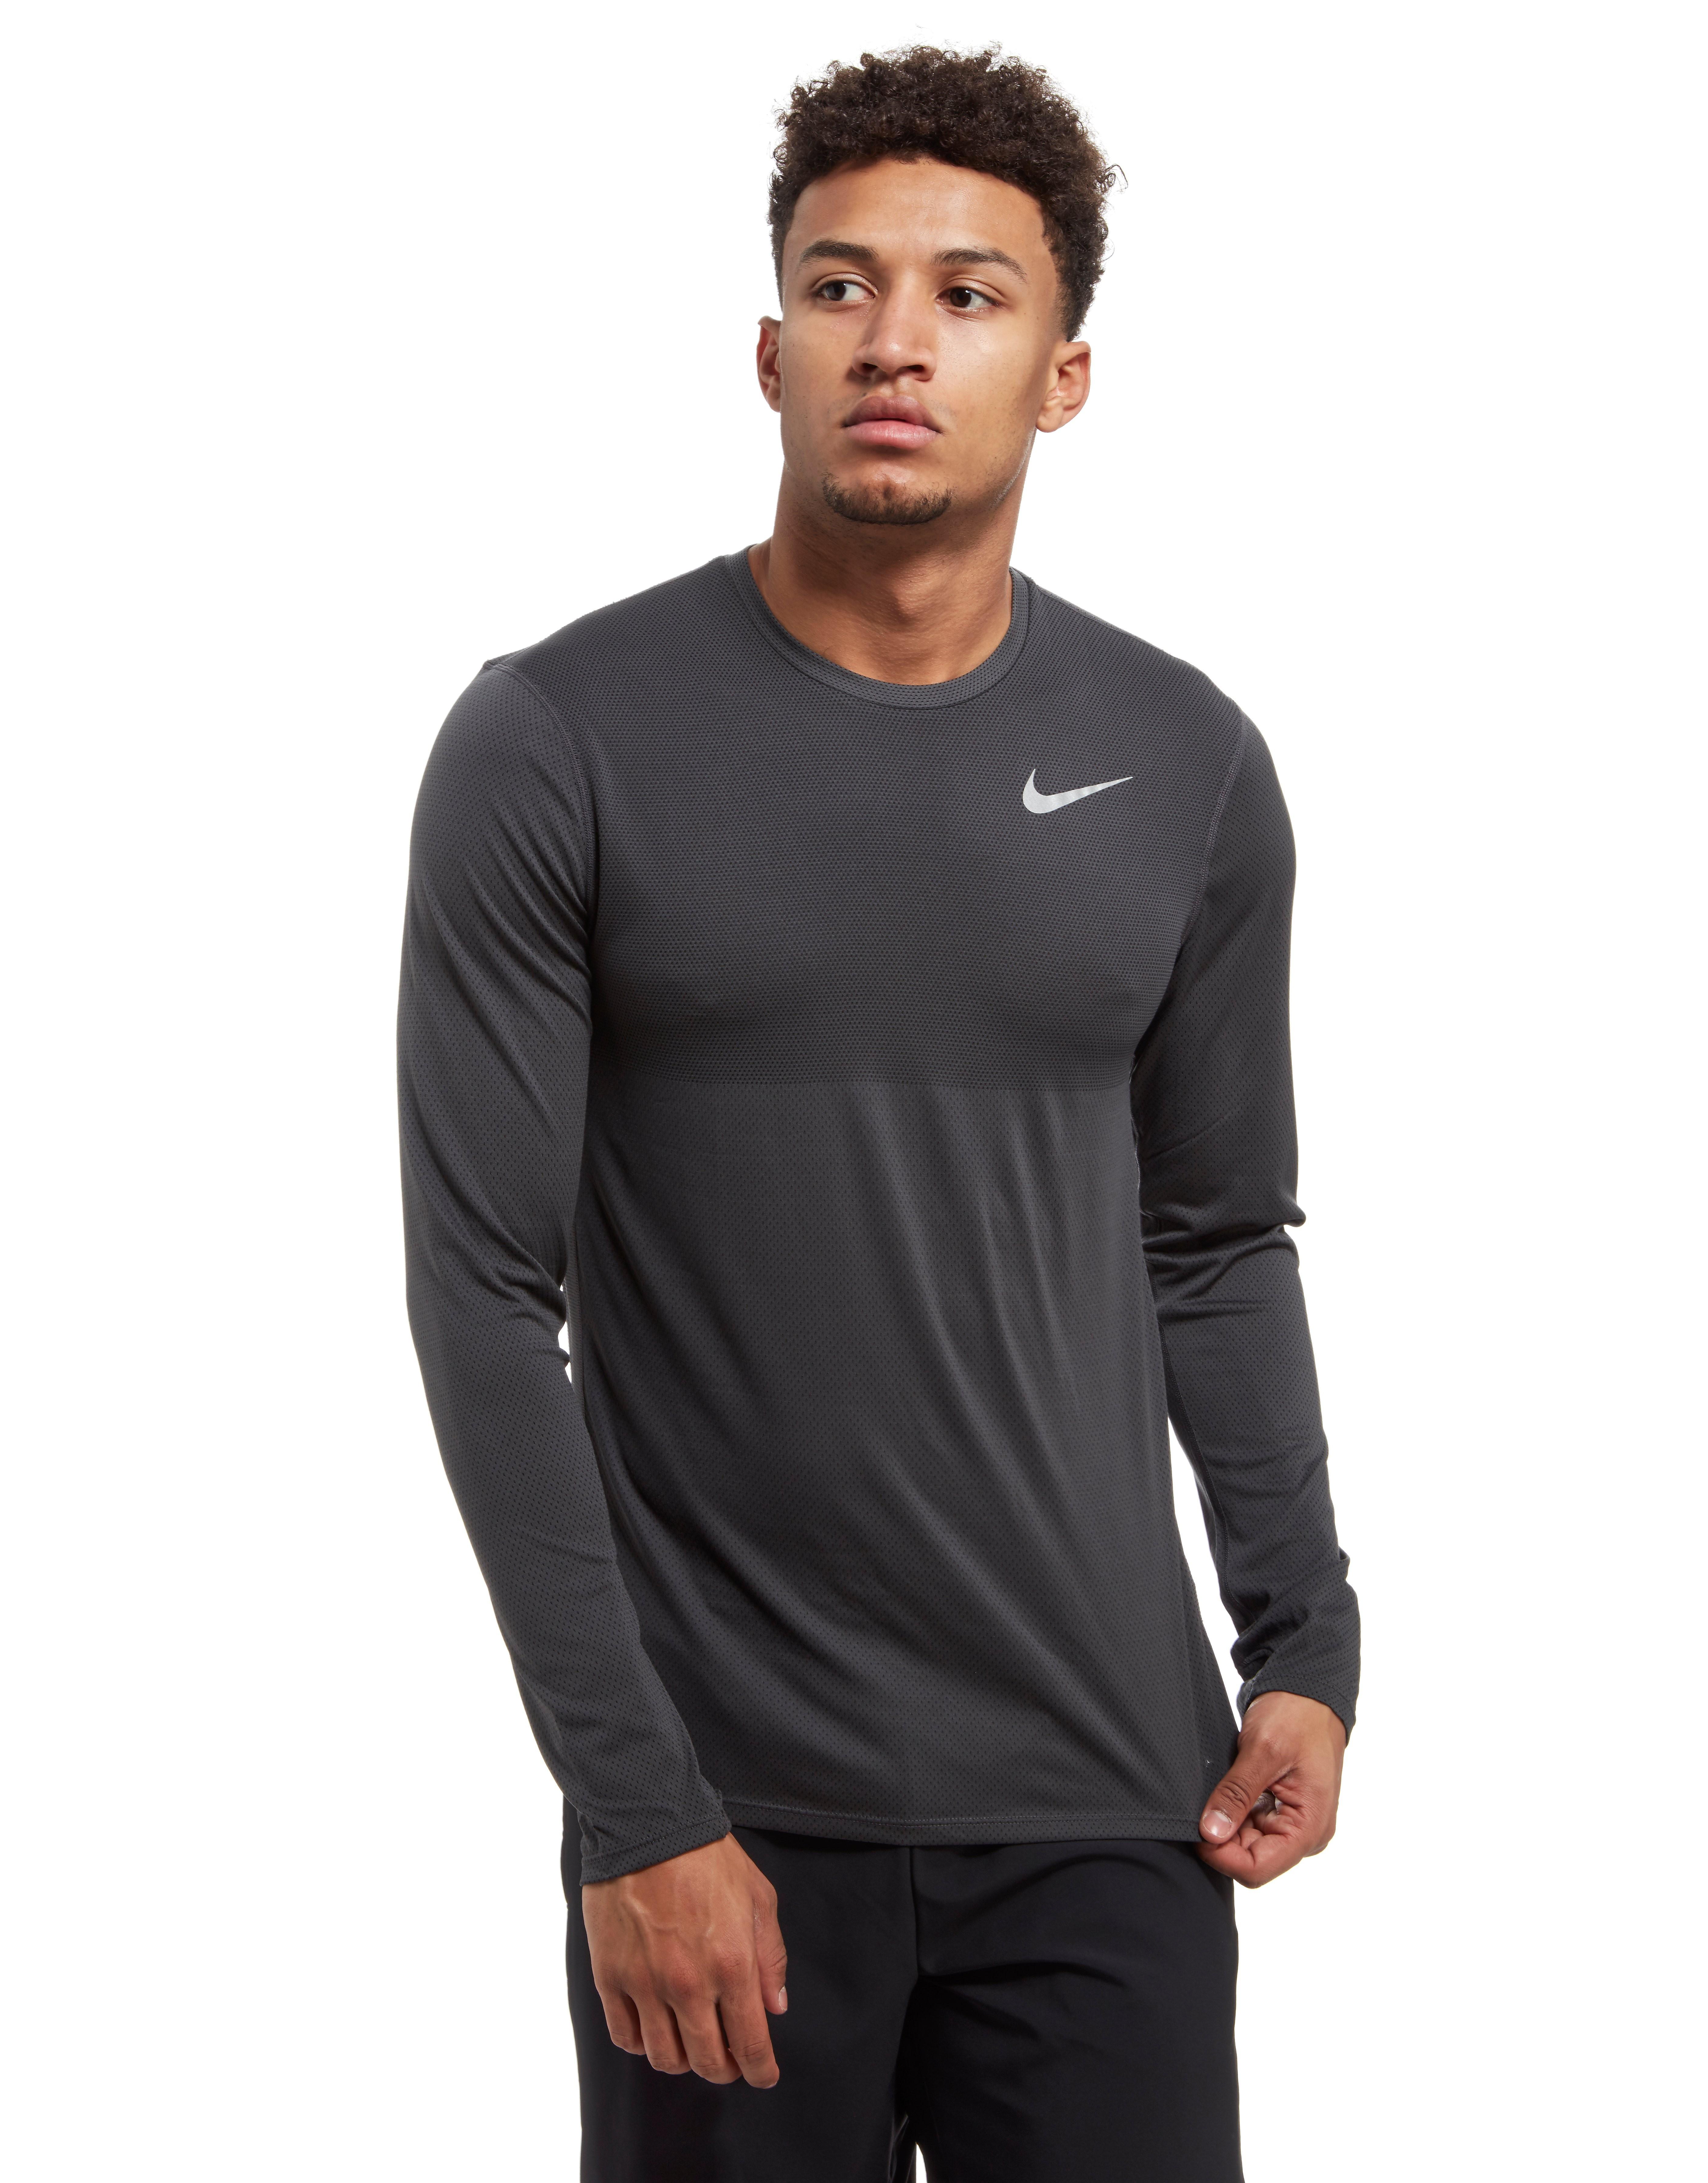 Nike Zonal Cooling Relay Longsleeve T-Shirt